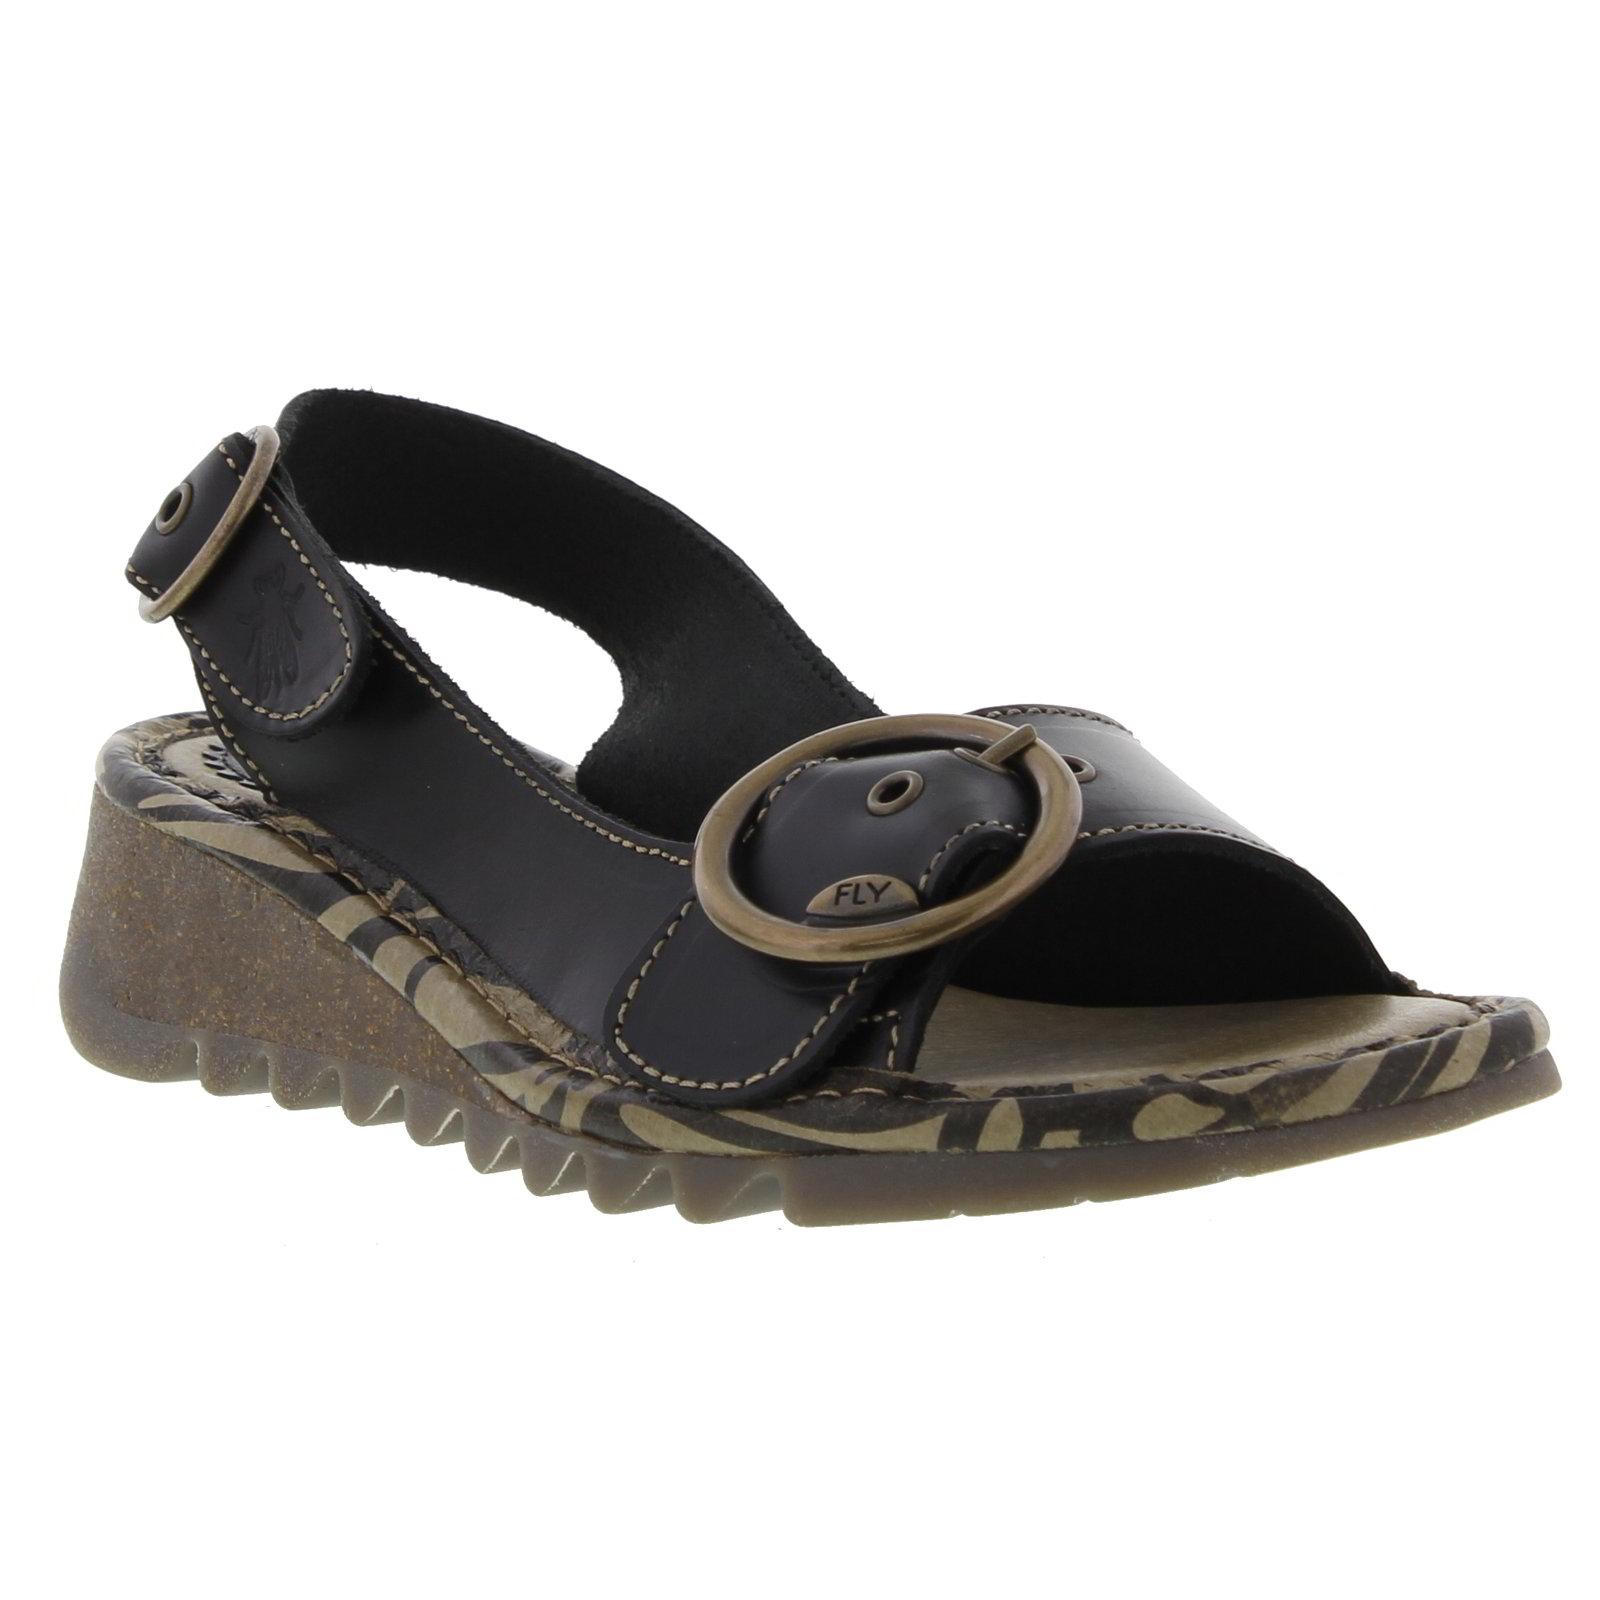 fly london womens tram leather slingback wedge sandals - uk 6 / eu 39